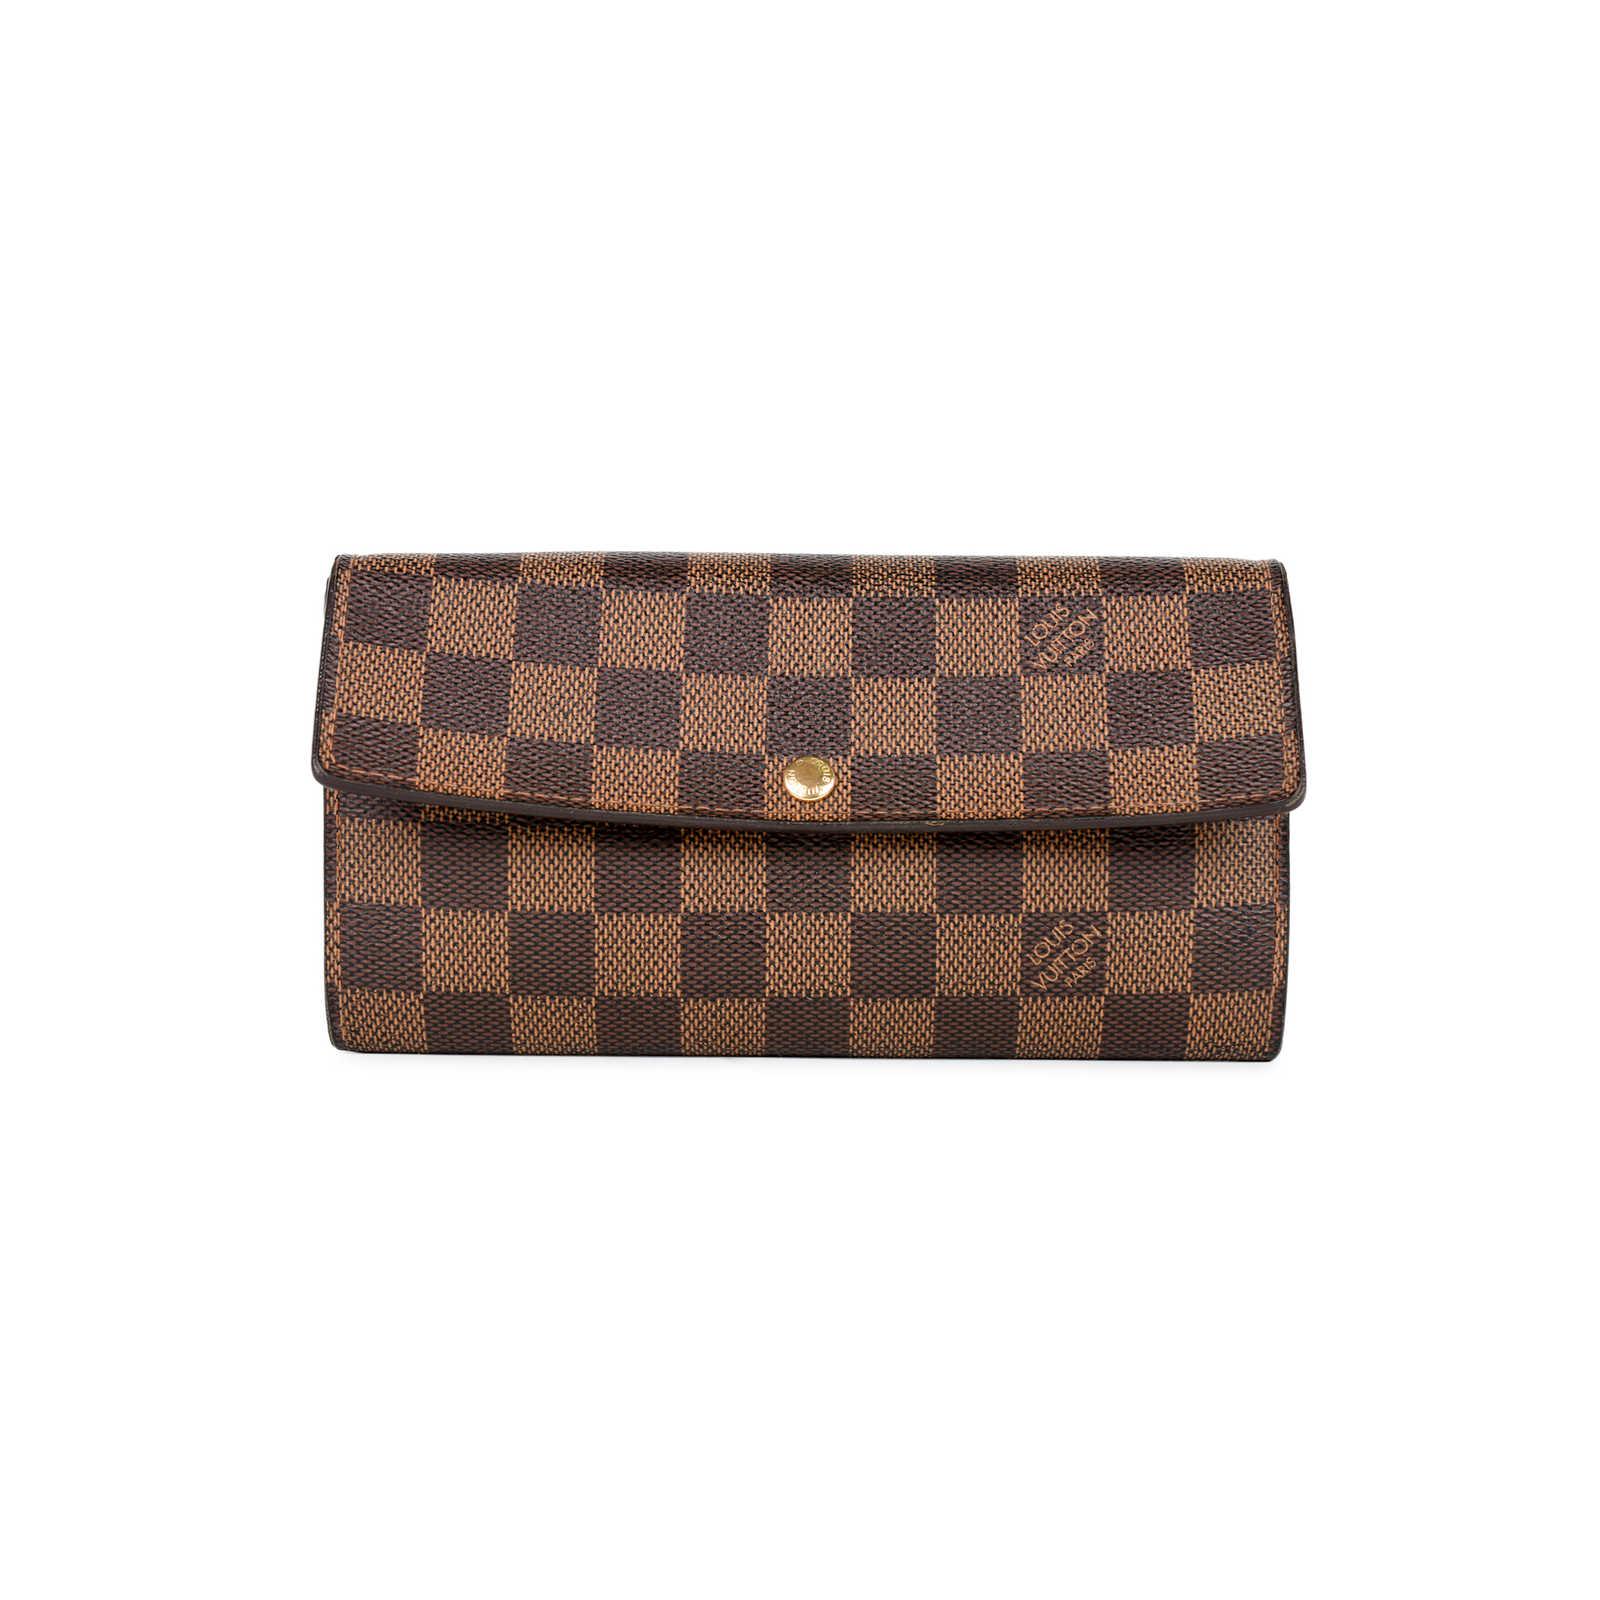 b4086a2ff361 Authentic Second Hand Louis Vuitton Sarah Wallet (PSS-375-00028) -  Thumbnail ...